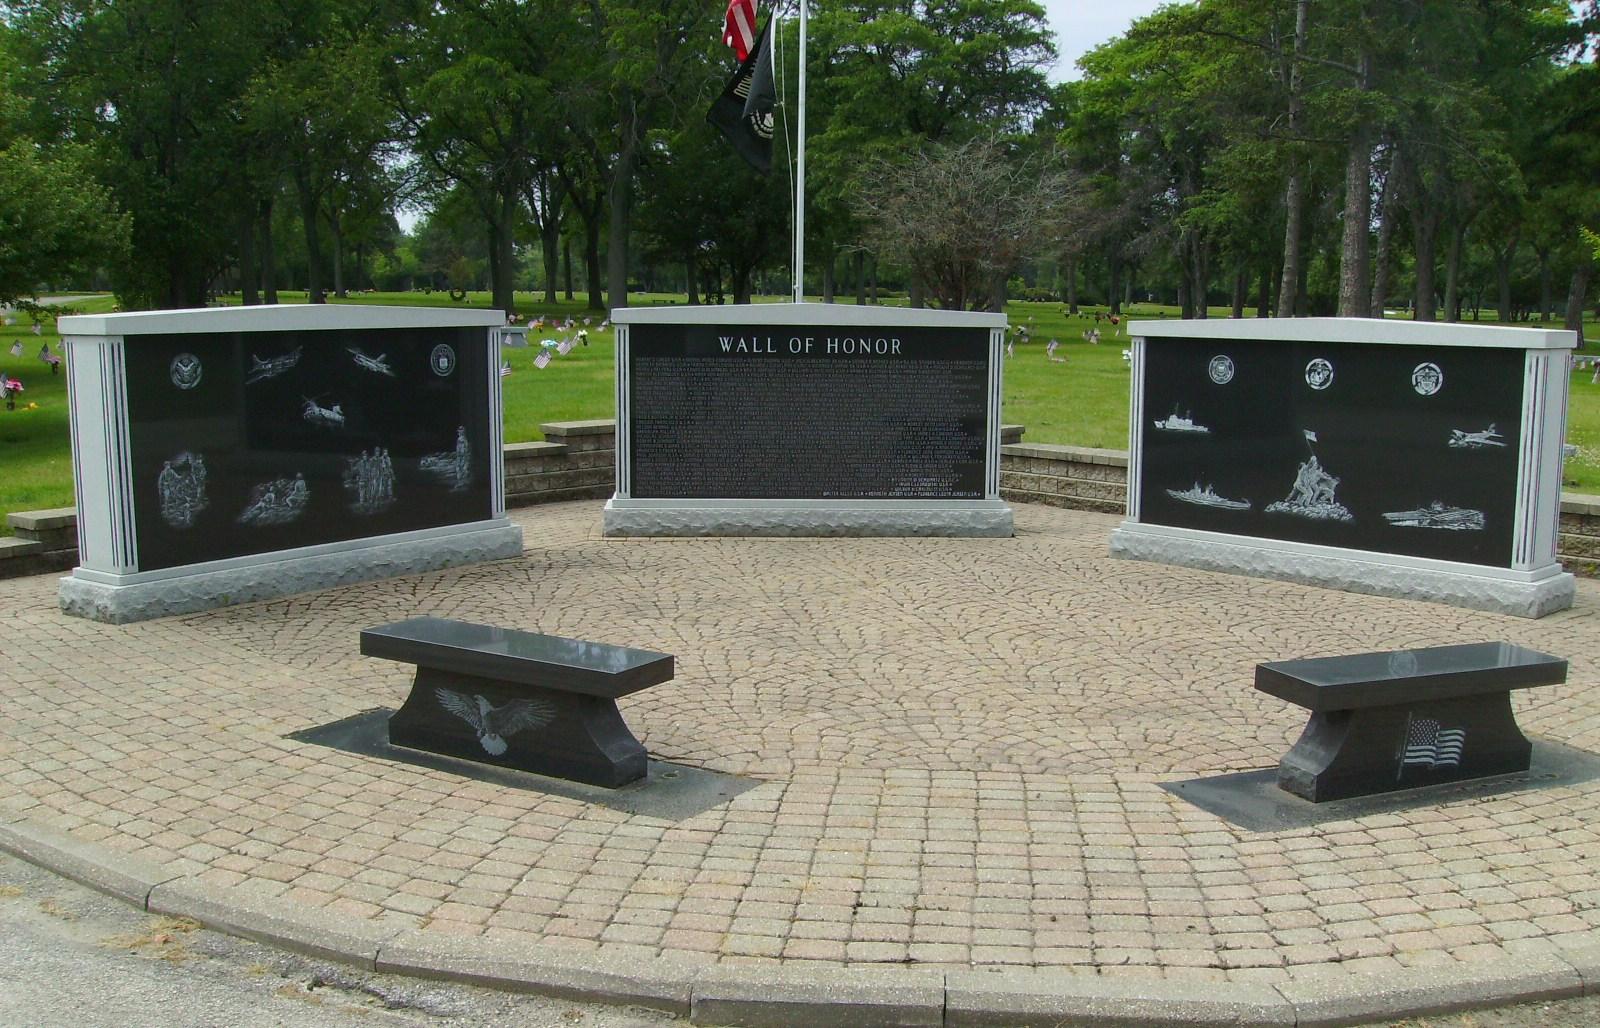 Mount Emblem Cemetery